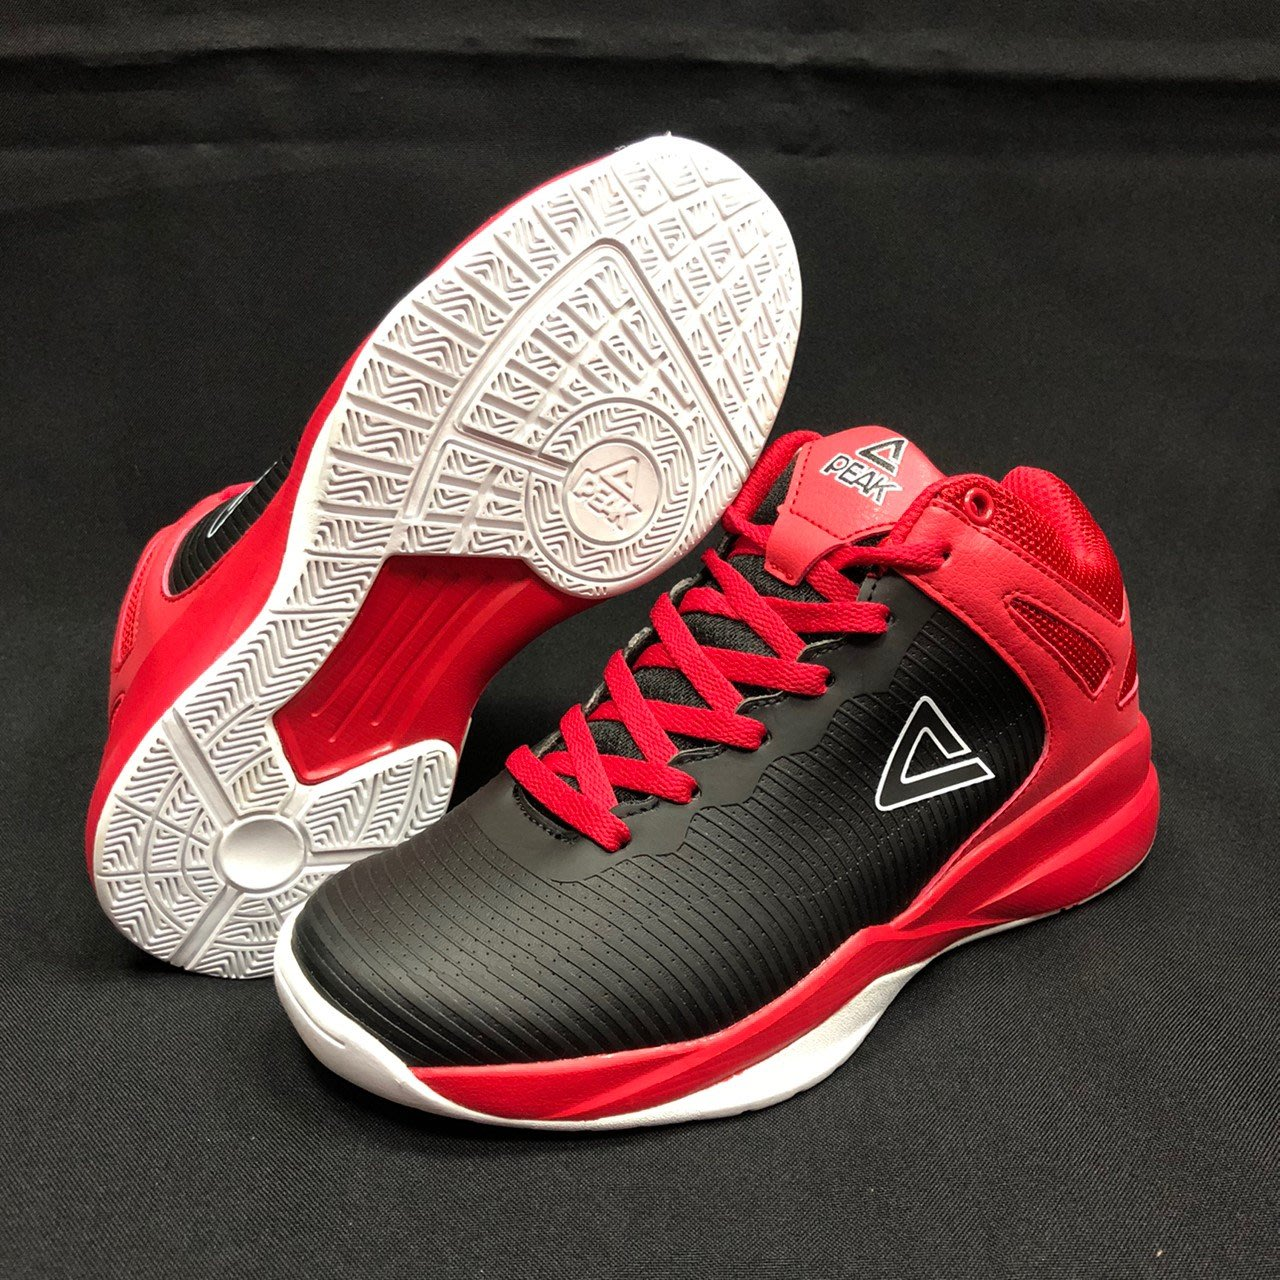 PEAK  籃球鞋 (有女生尺寸)  EW8220A   黑紅  T20   亮禹體育PEAK台灣經銷商